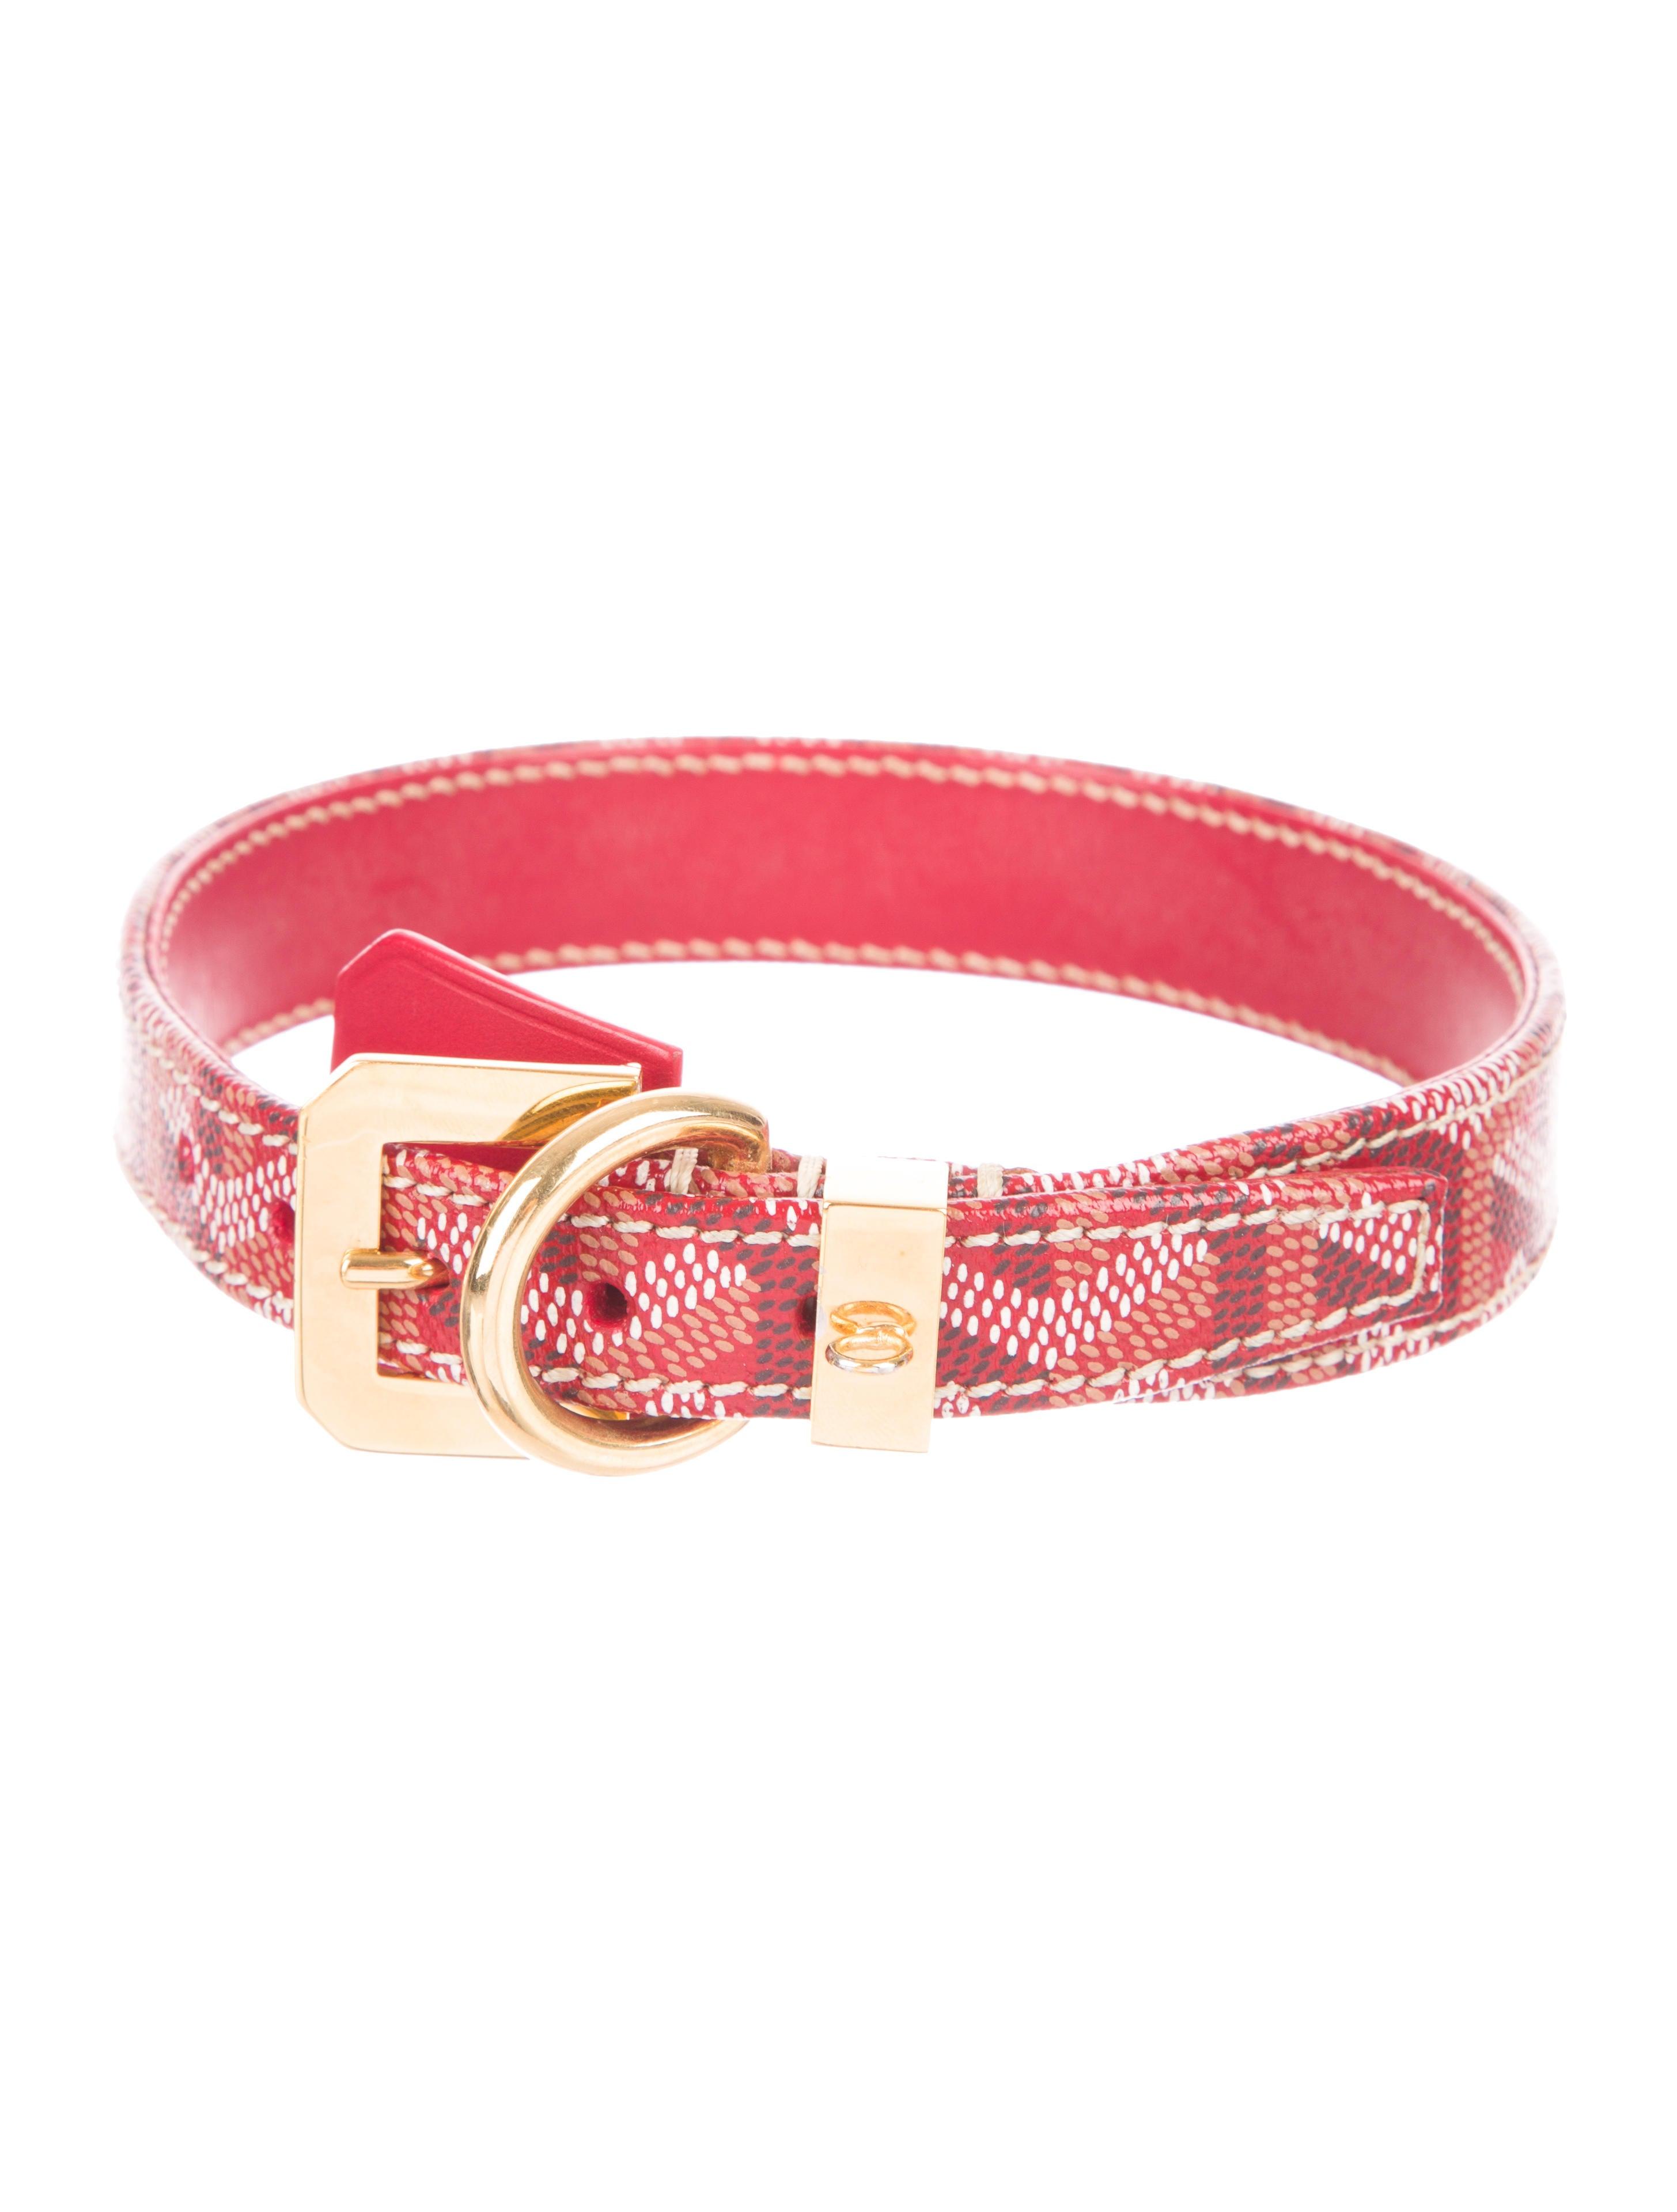 goyard dog collar